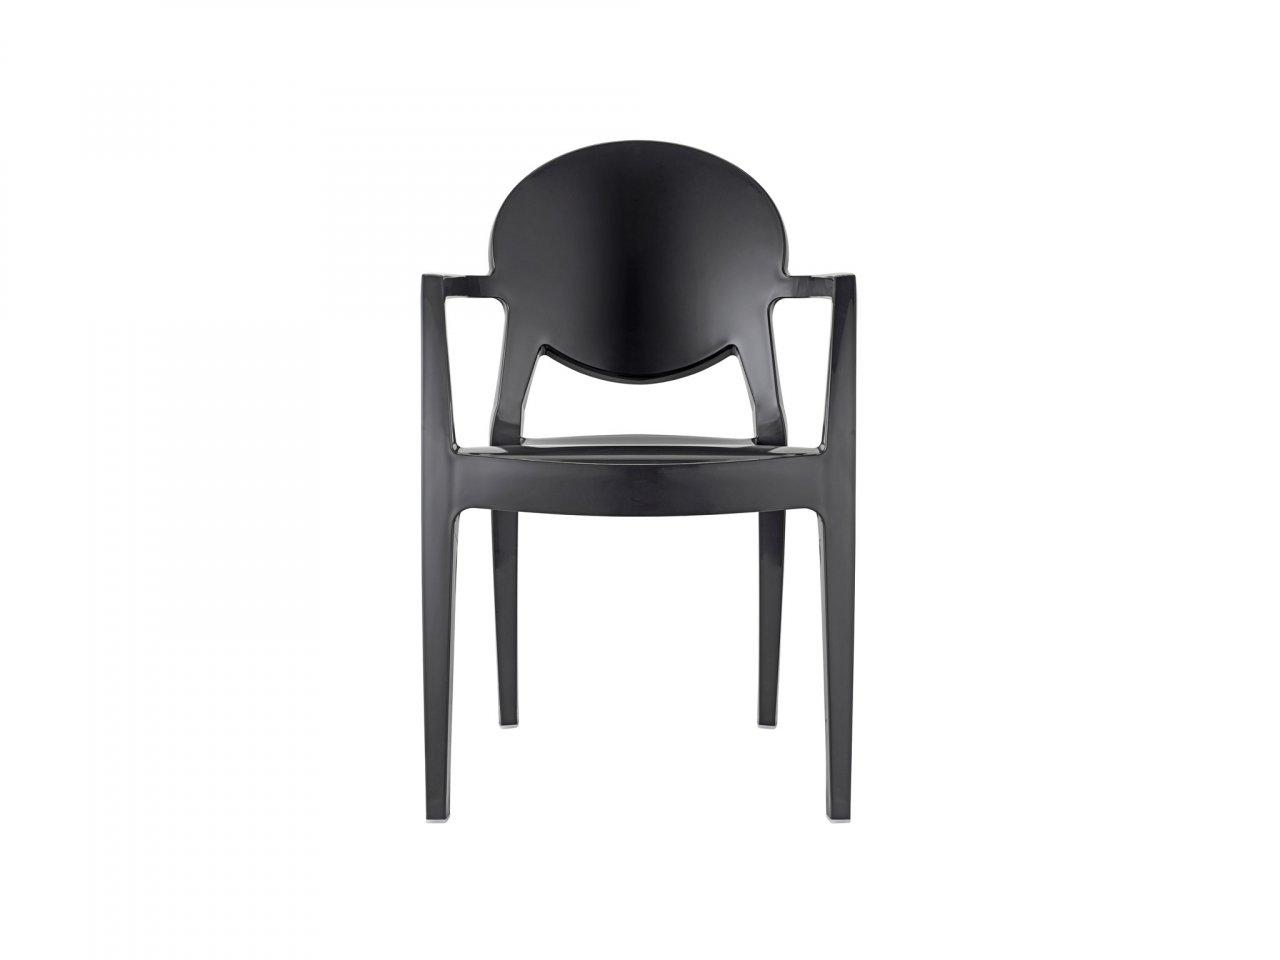 Sedia Con Braccioli Igloo Tecnopolimero -10